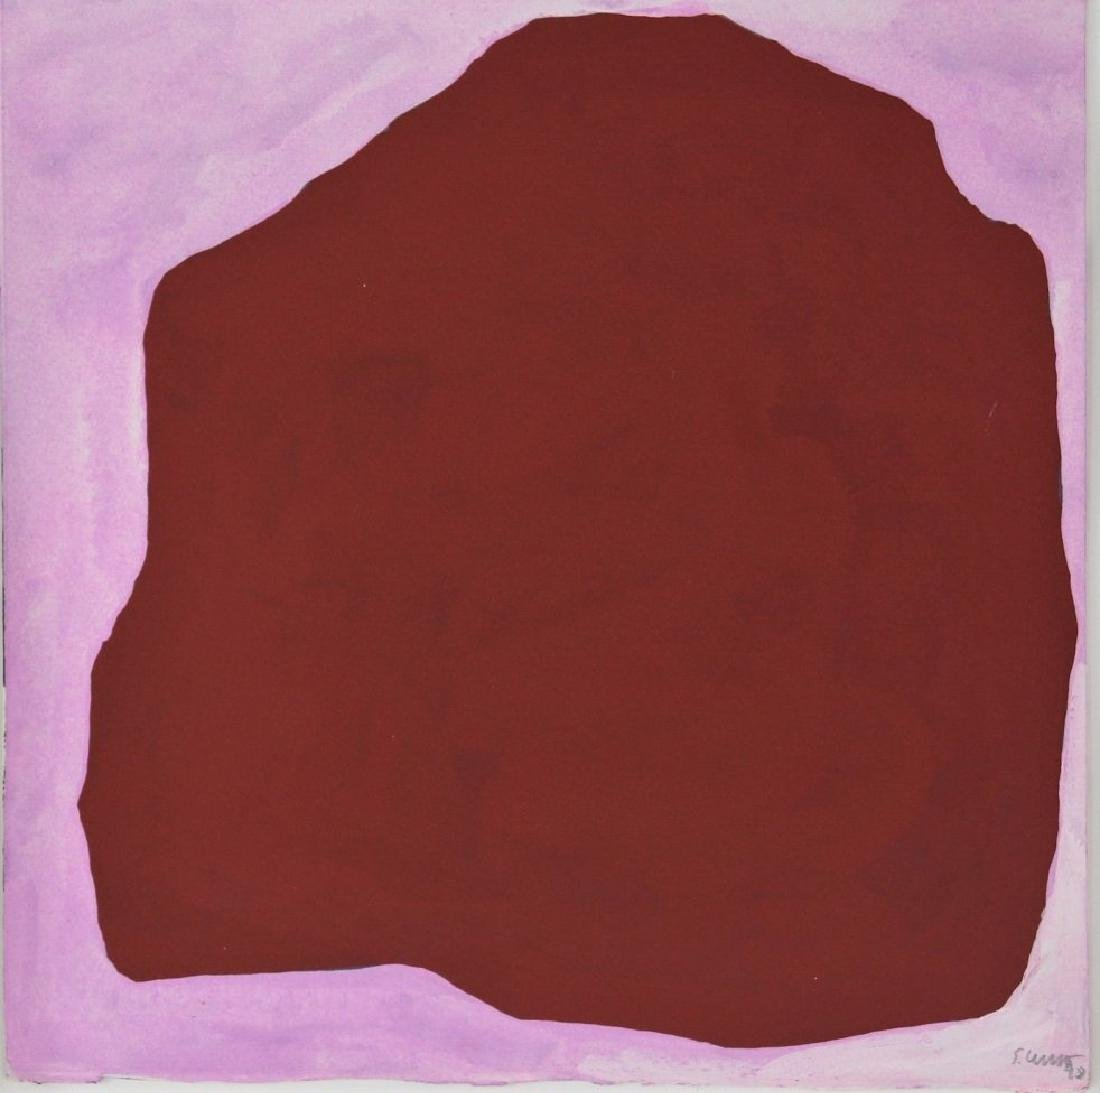 Sol LeWitt (American, 1928-2007) - 2